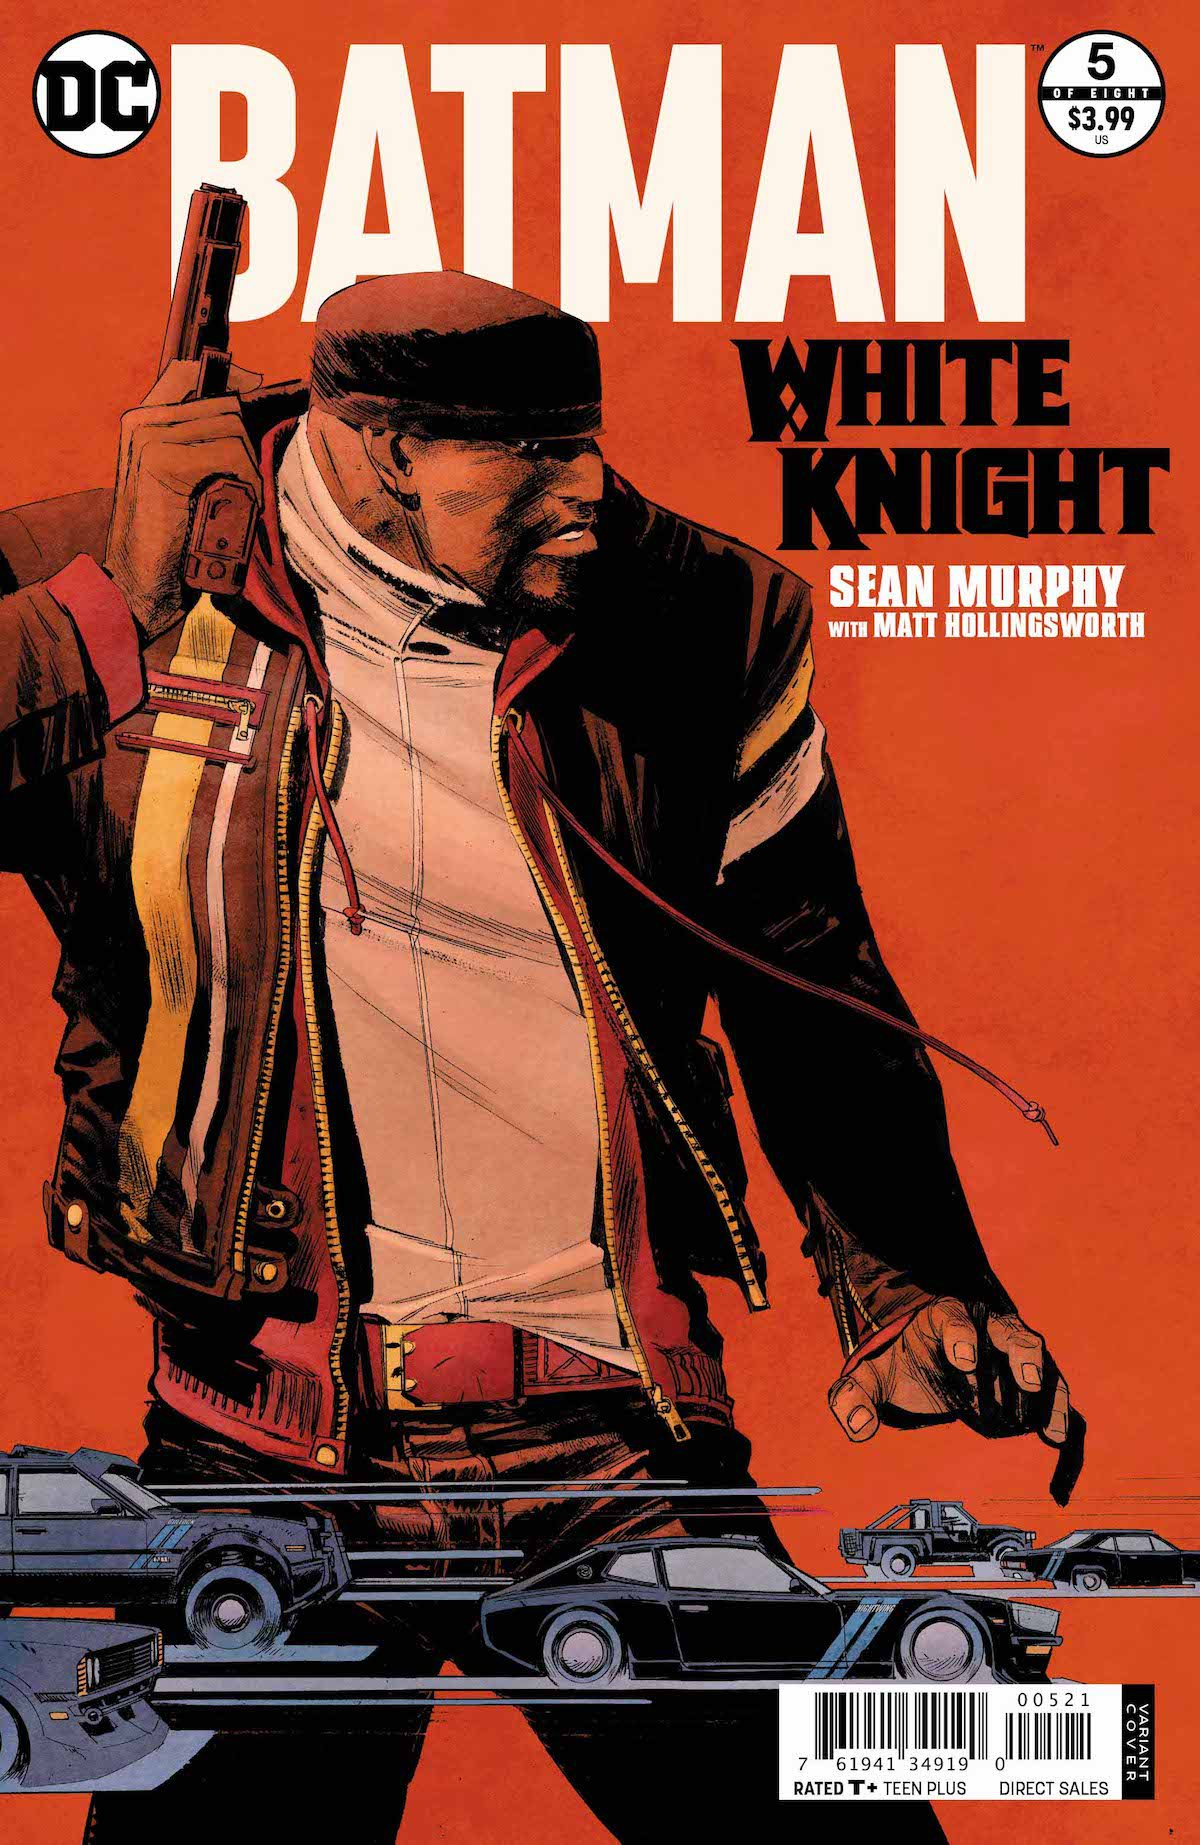 Batman: White Knight #5 varian cover